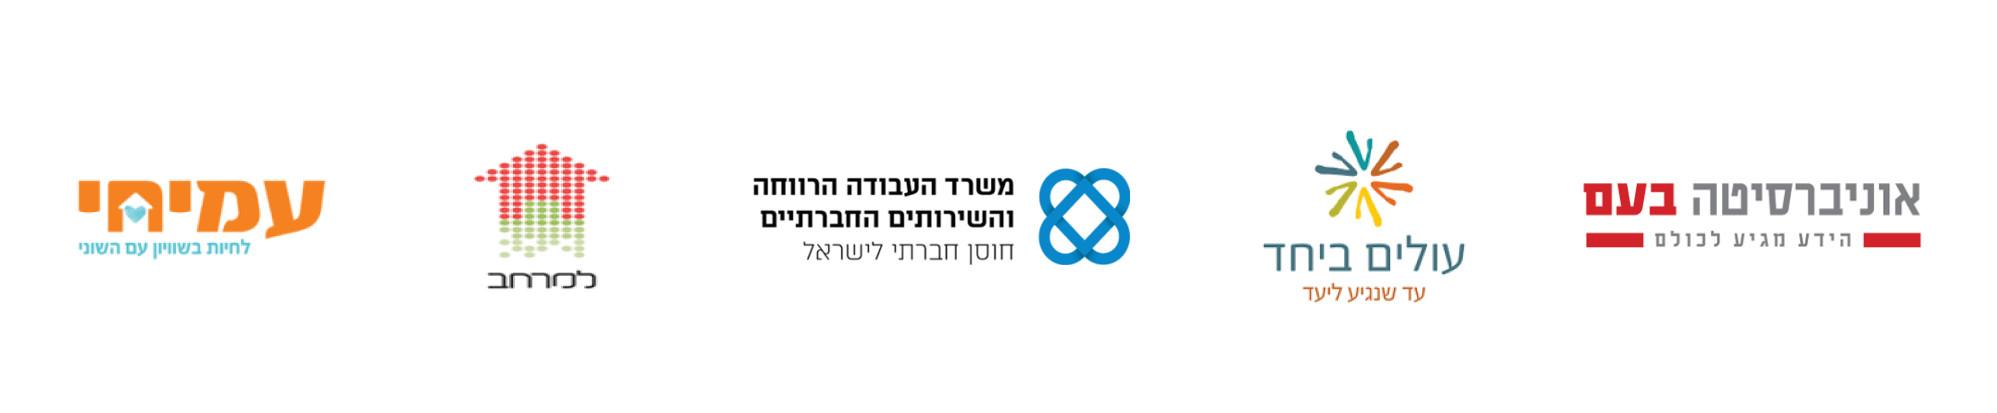 logos_in_line_2021_B7.jpg